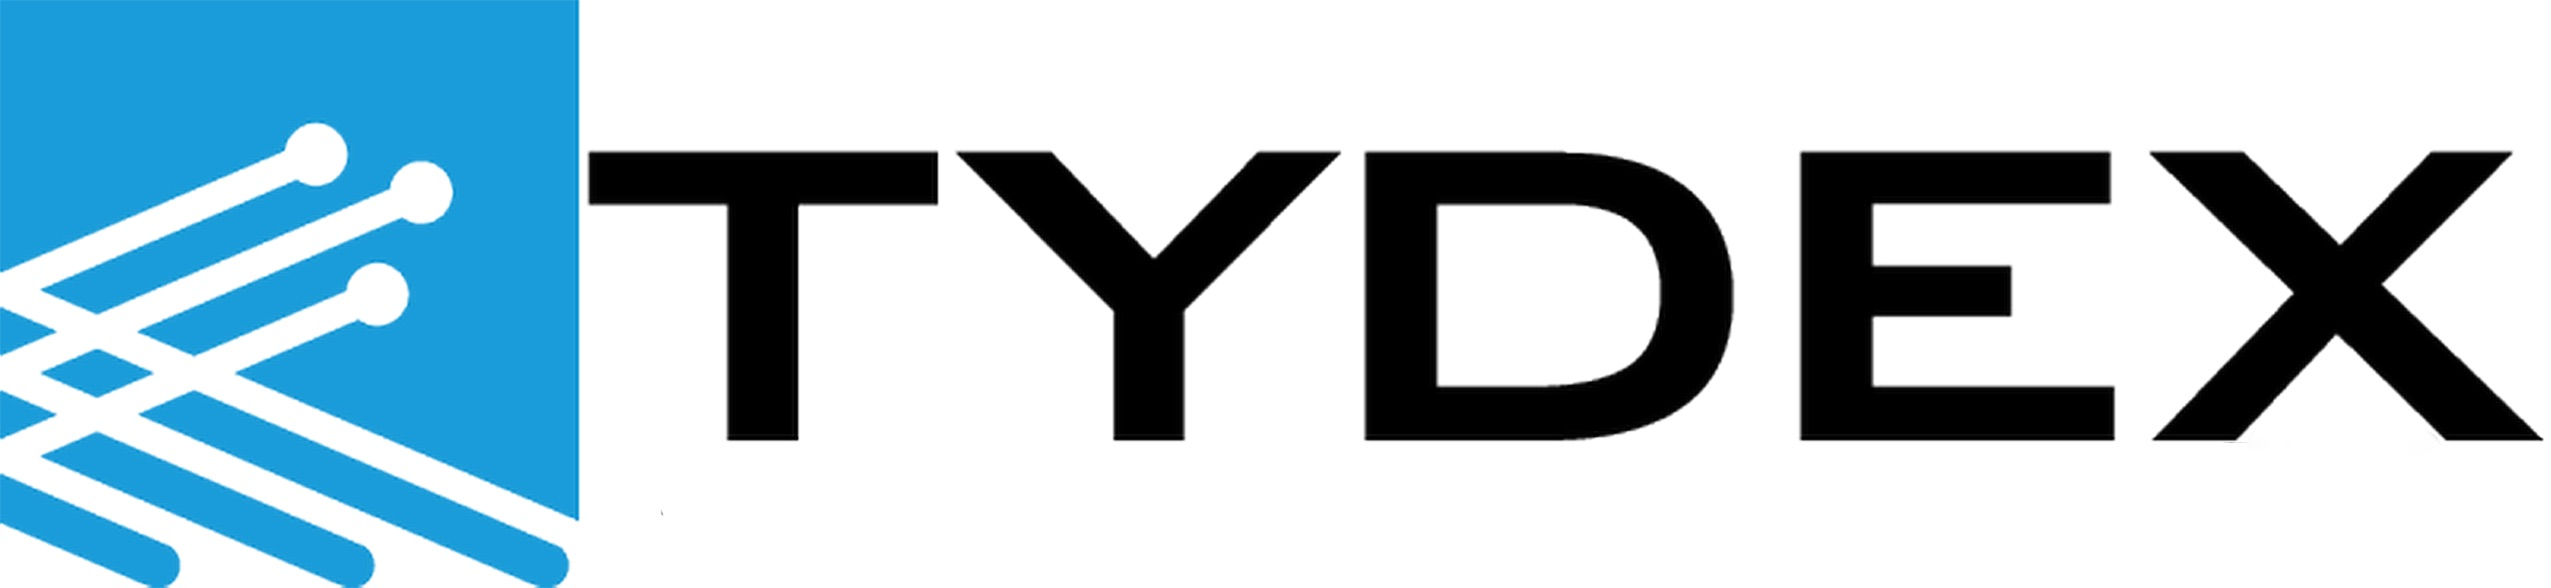 Tydex_logo_90